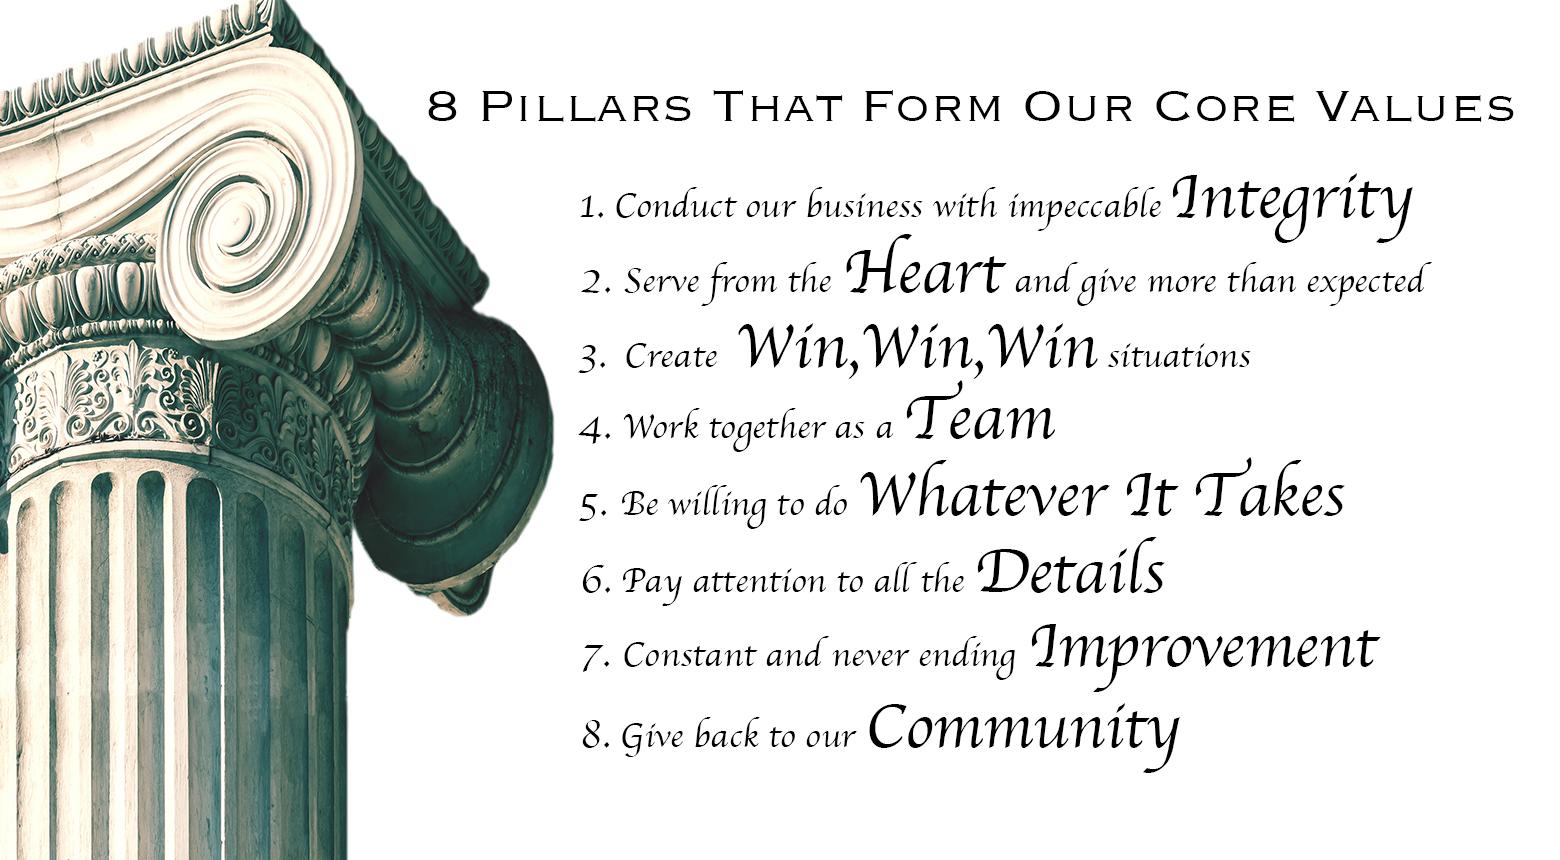 8 pillars.jpg